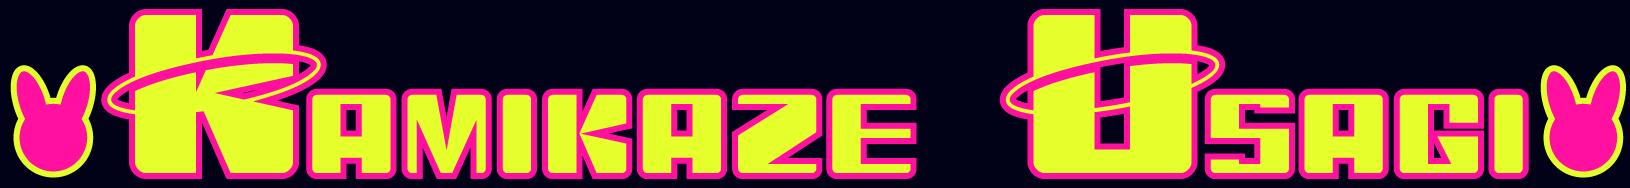 Kamikaze Usagi 2